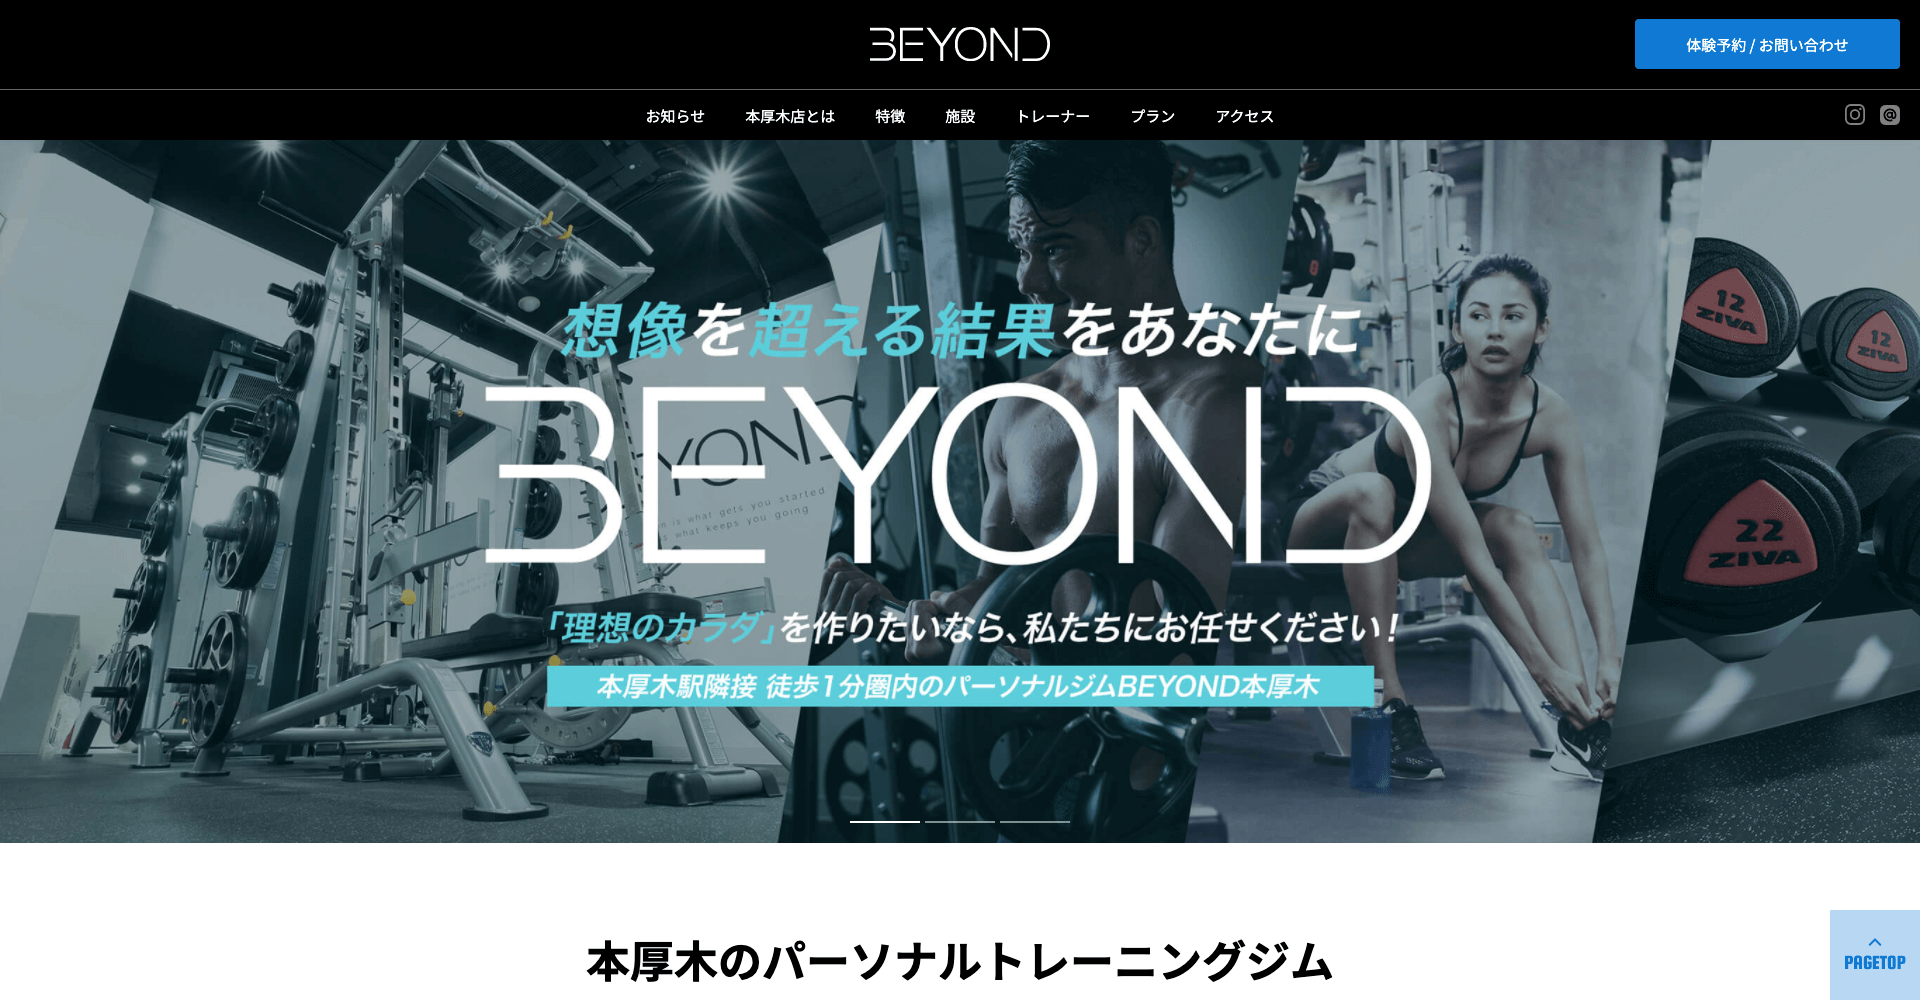 BEYOND(ビヨンド)ジム 本厚木店